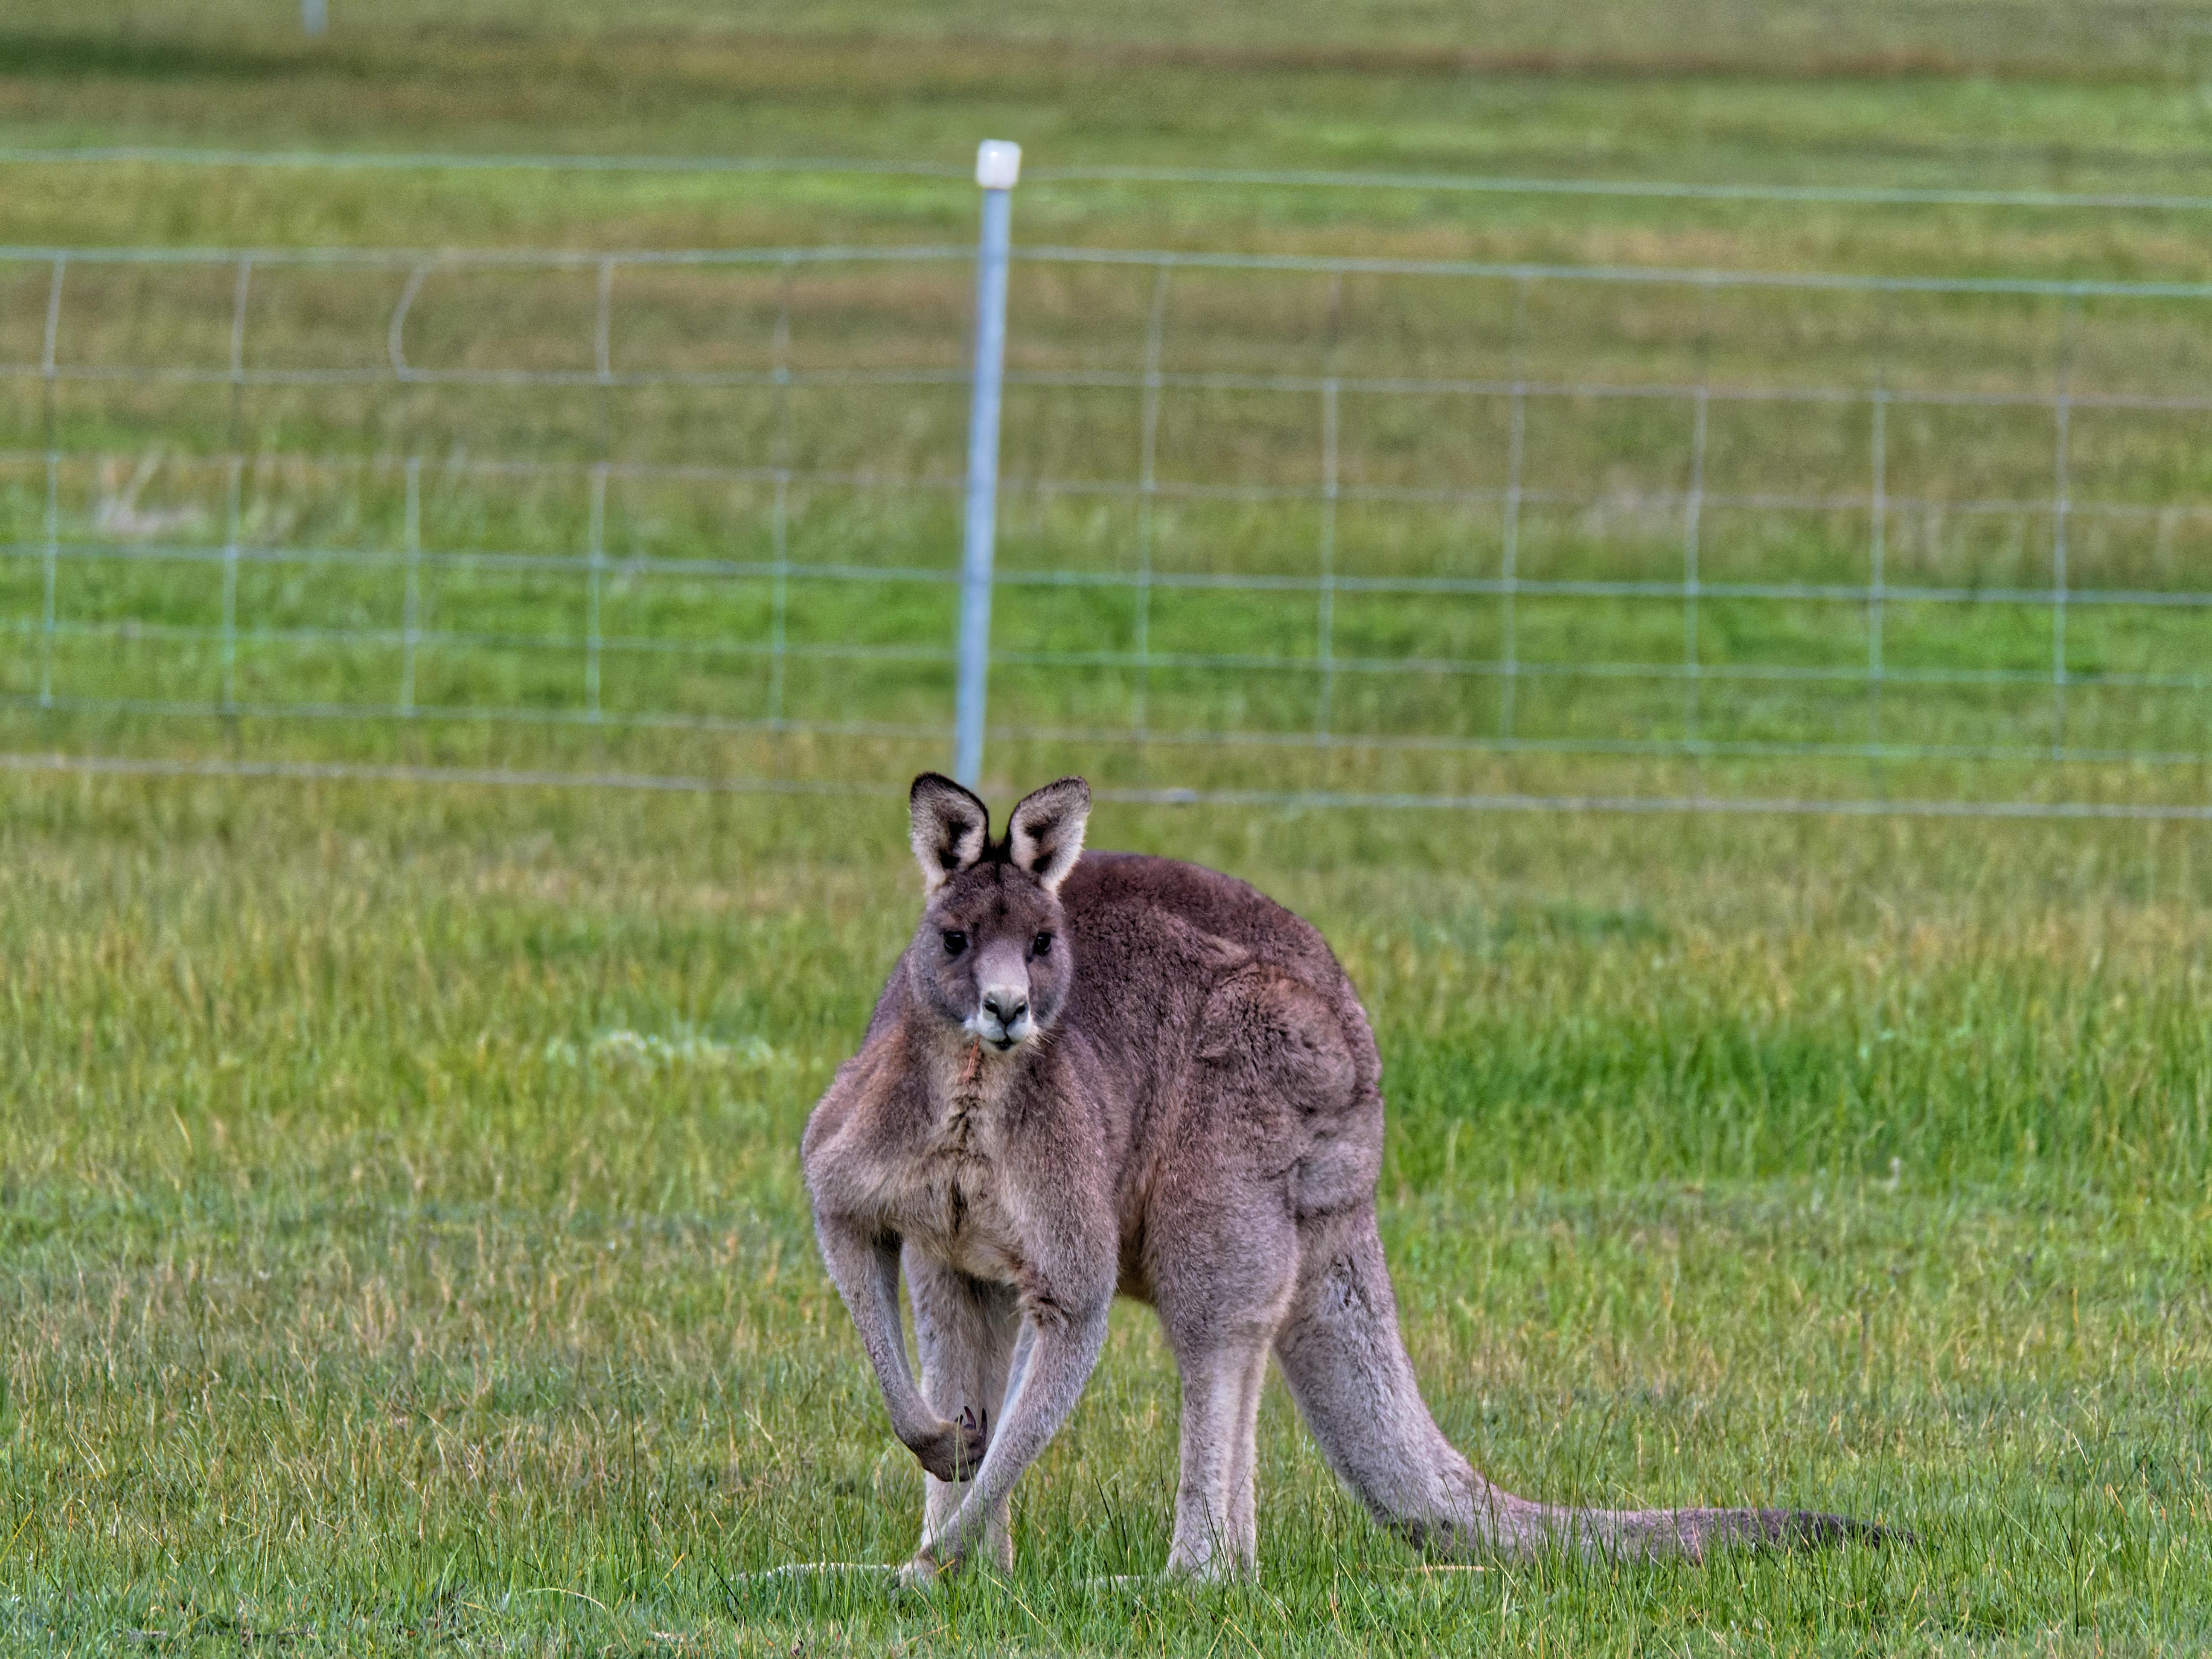 This should be Kangaroos-7.jpeg.  Is it missing?